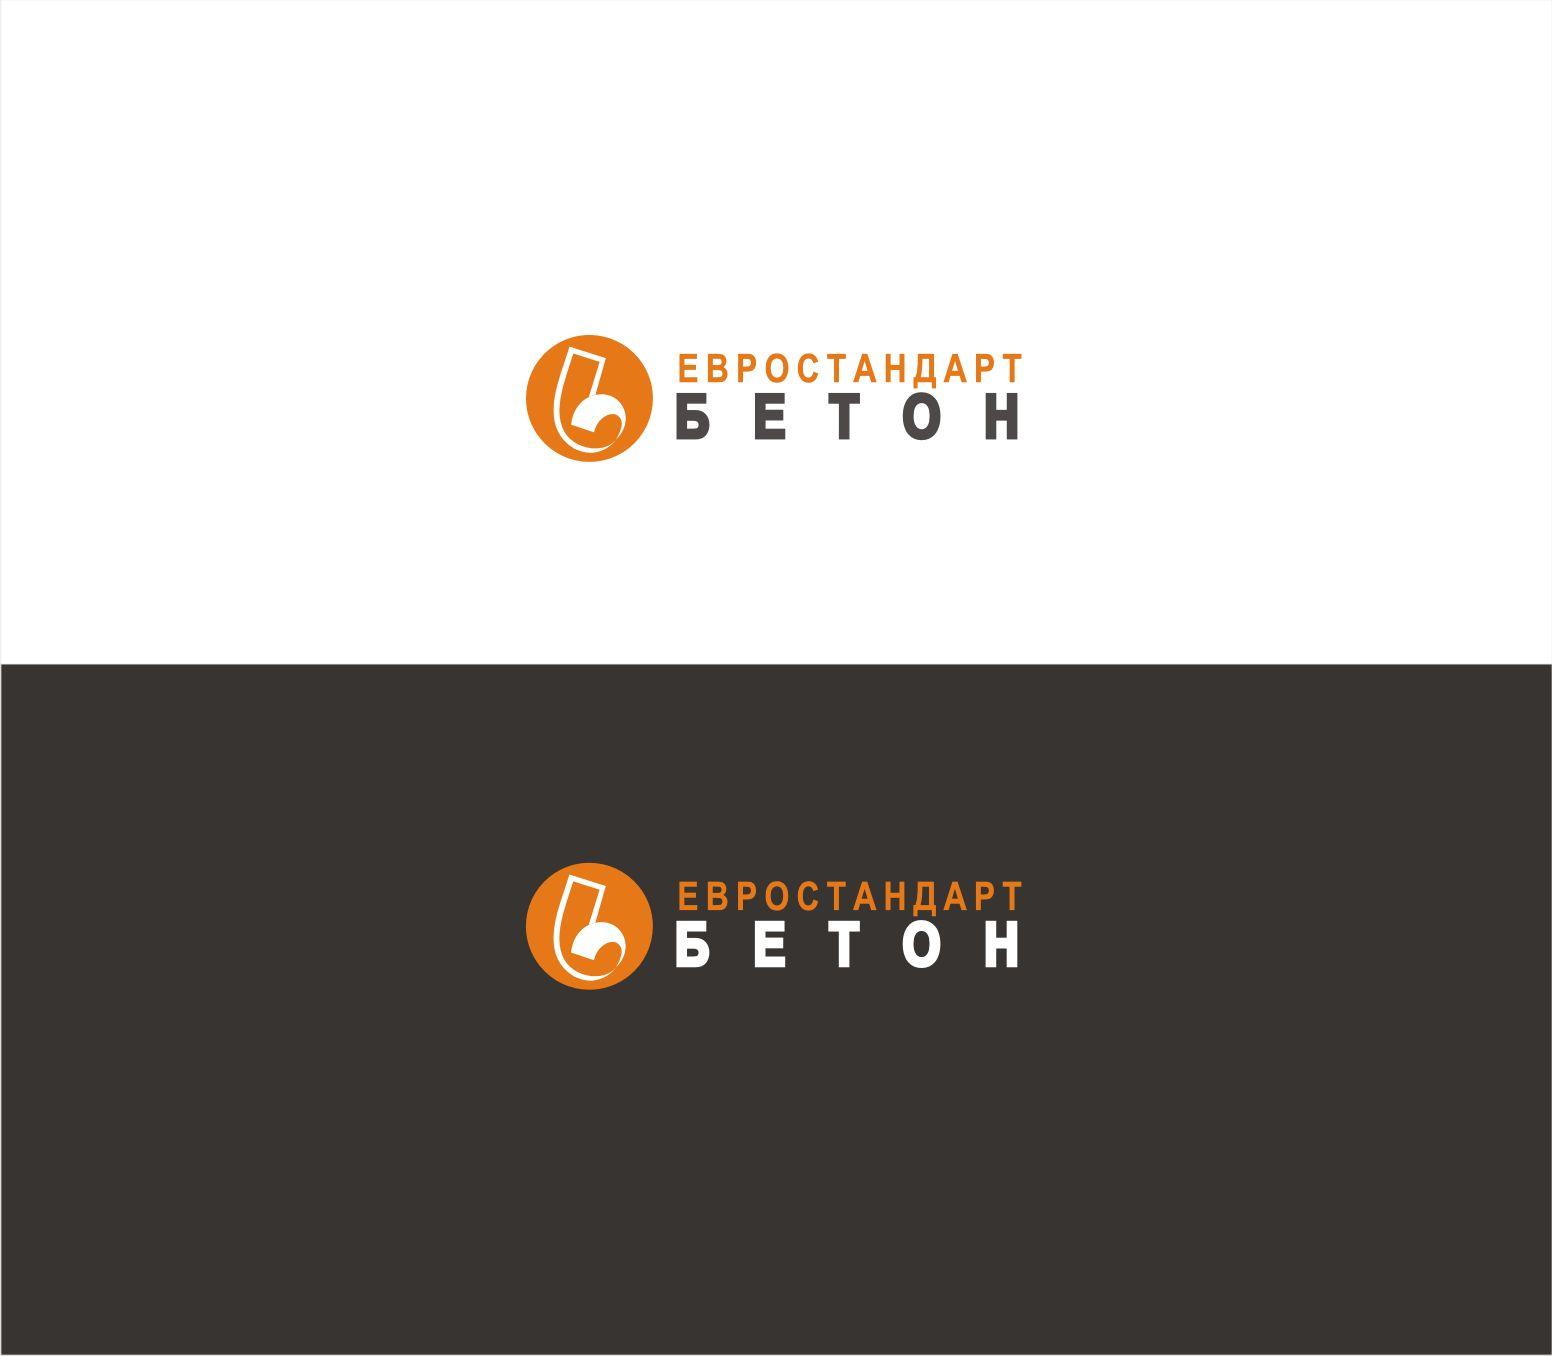 Логотип для ЕвроСтандарт Бетон - дизайнер vladim